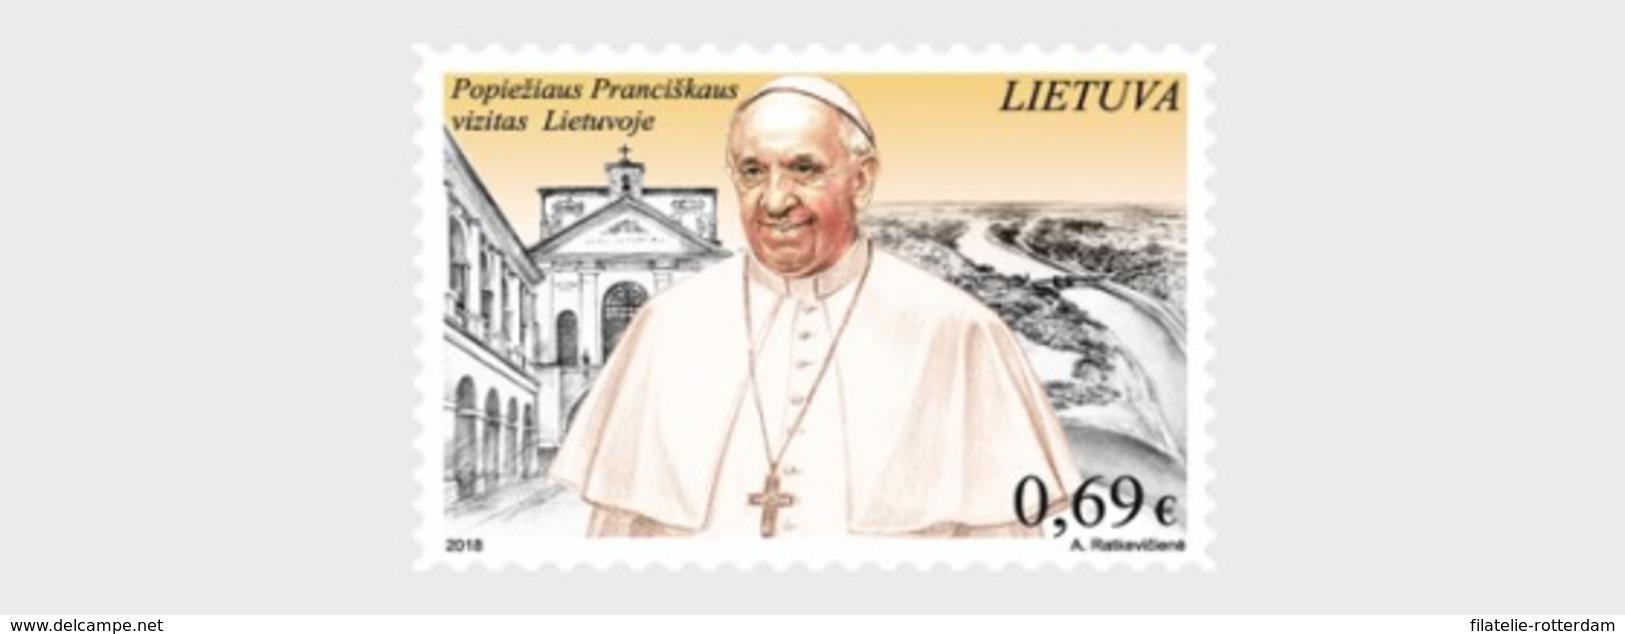 Litouwen / Lithuania - Postfris / MNH - Bezoek Van De Paus 2018 - Lithuania